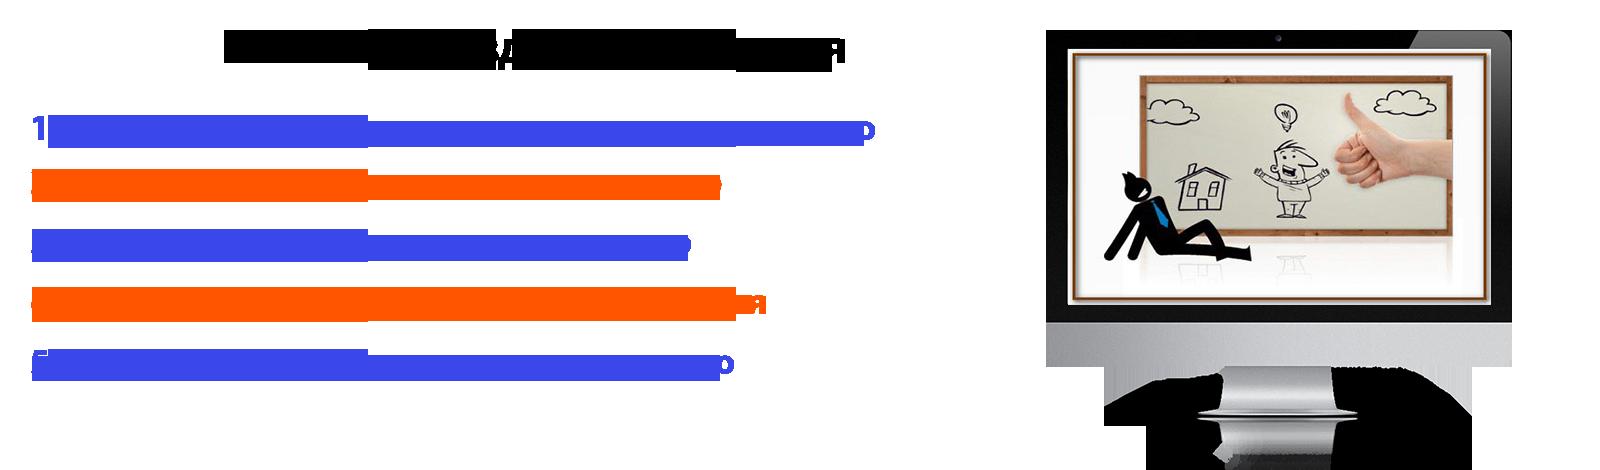 Blok_6_video